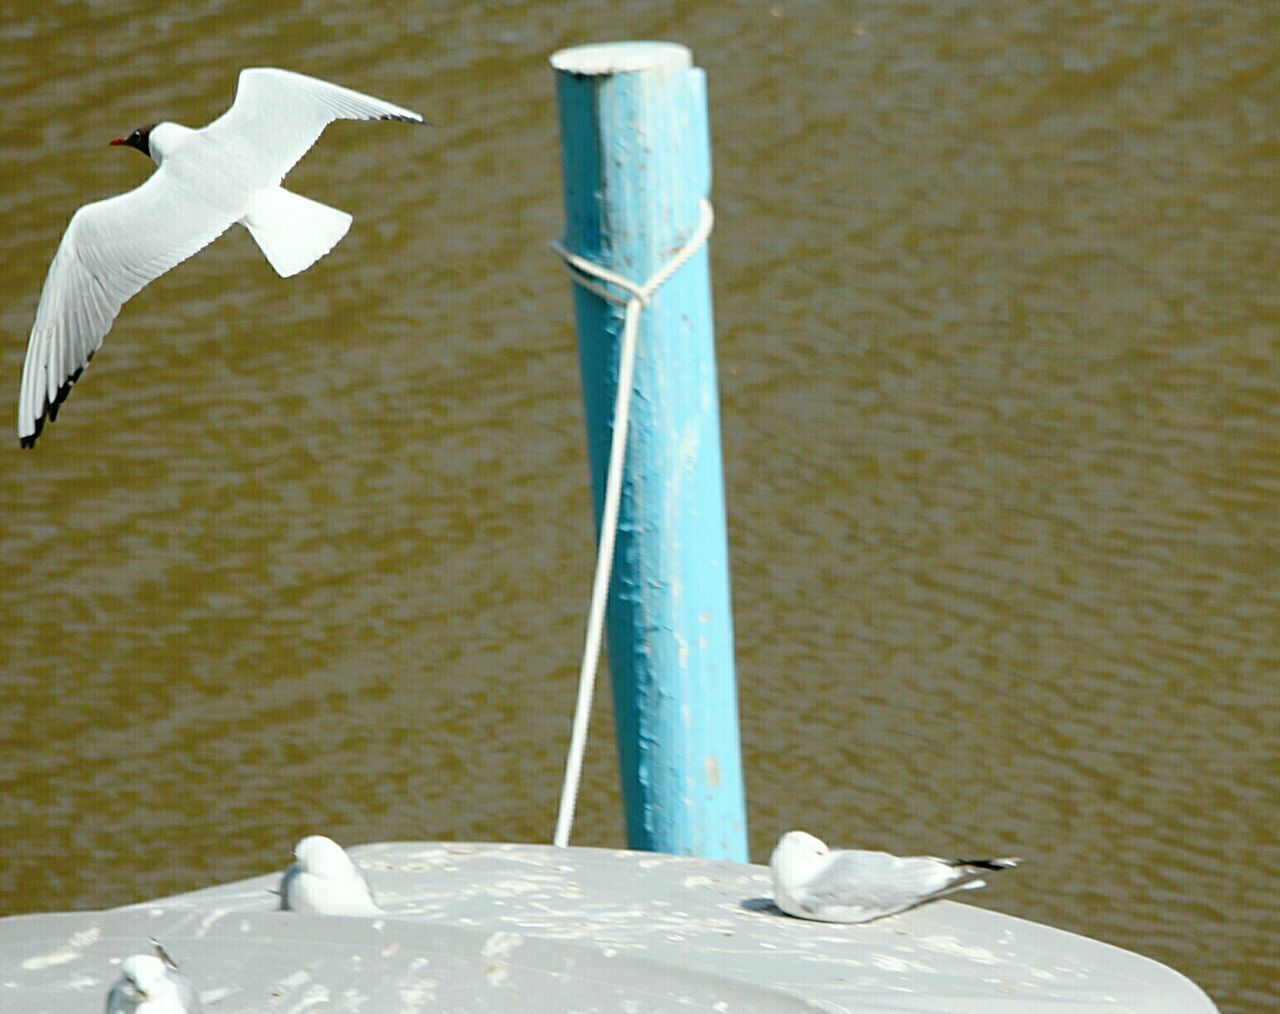 Seagull Seagulls In Flight Seagulls City Summer2016 Urban Birds Summer Time  Finland Summer Turku Aurajoki Aura River Black Headed Gull Blackheaded Gull Laughing Gulls Laughing Gull Gulls In Flight Finland